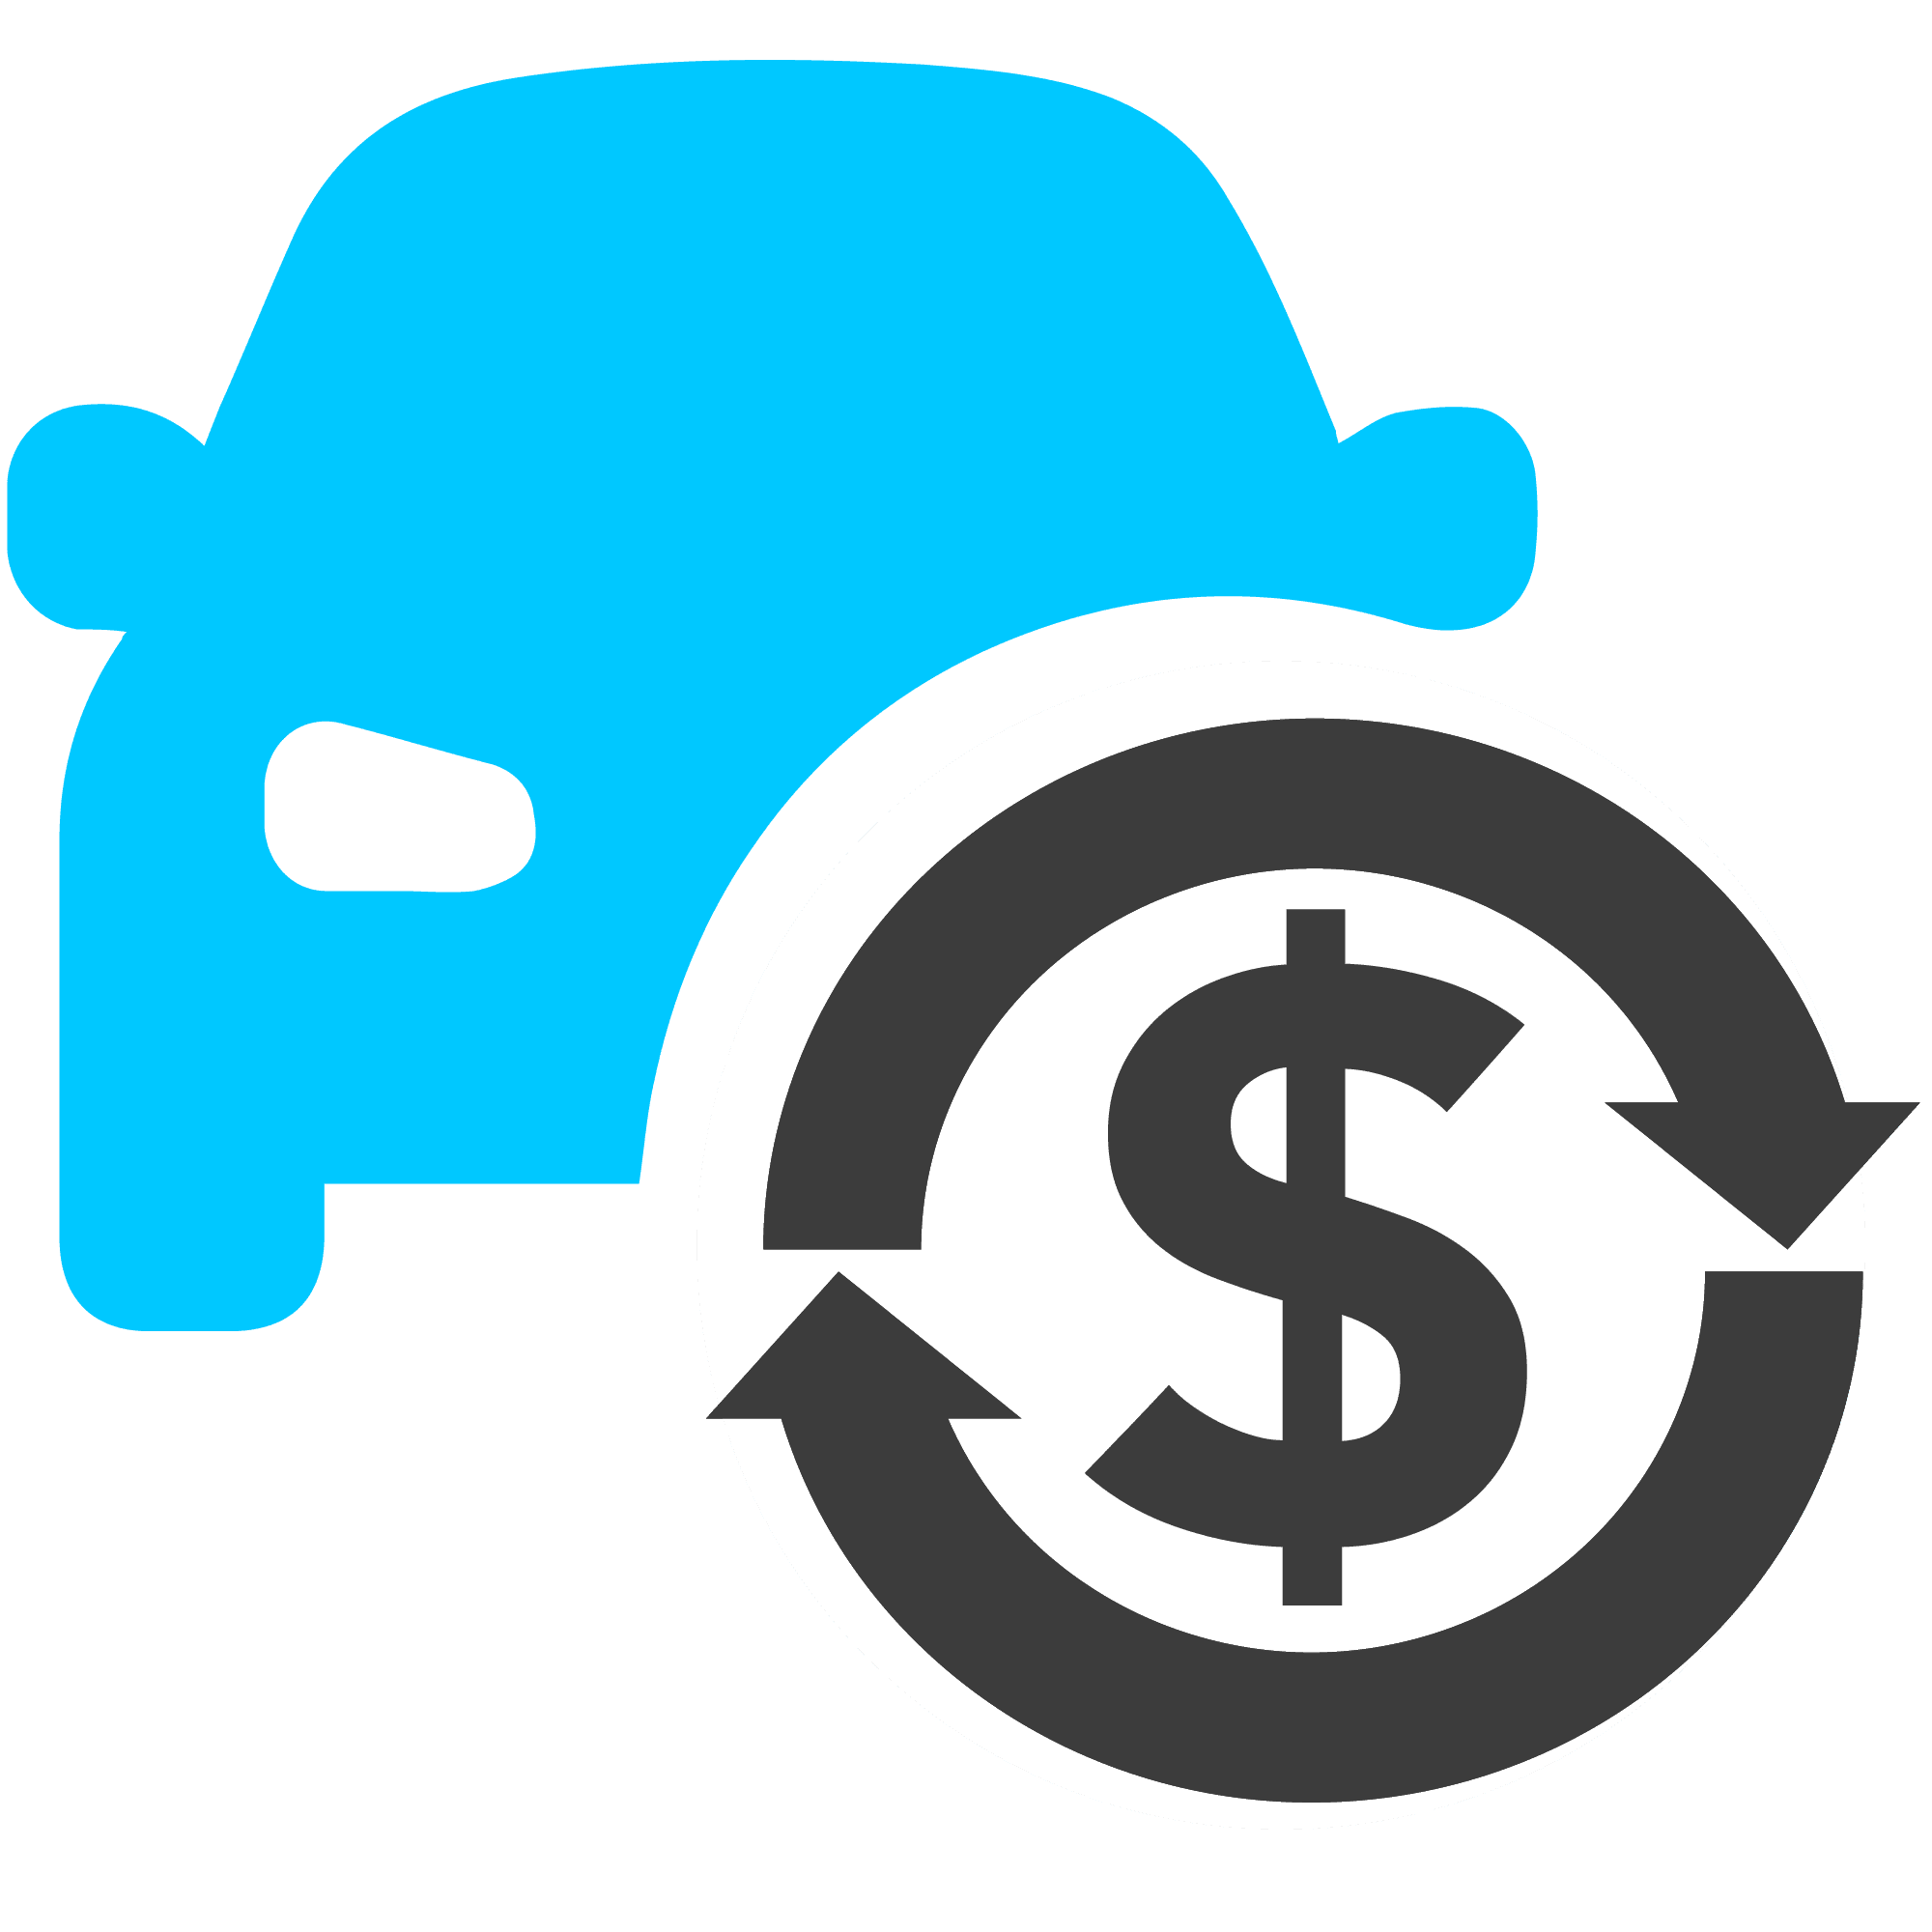 Subscriptionmanagement_new@4x